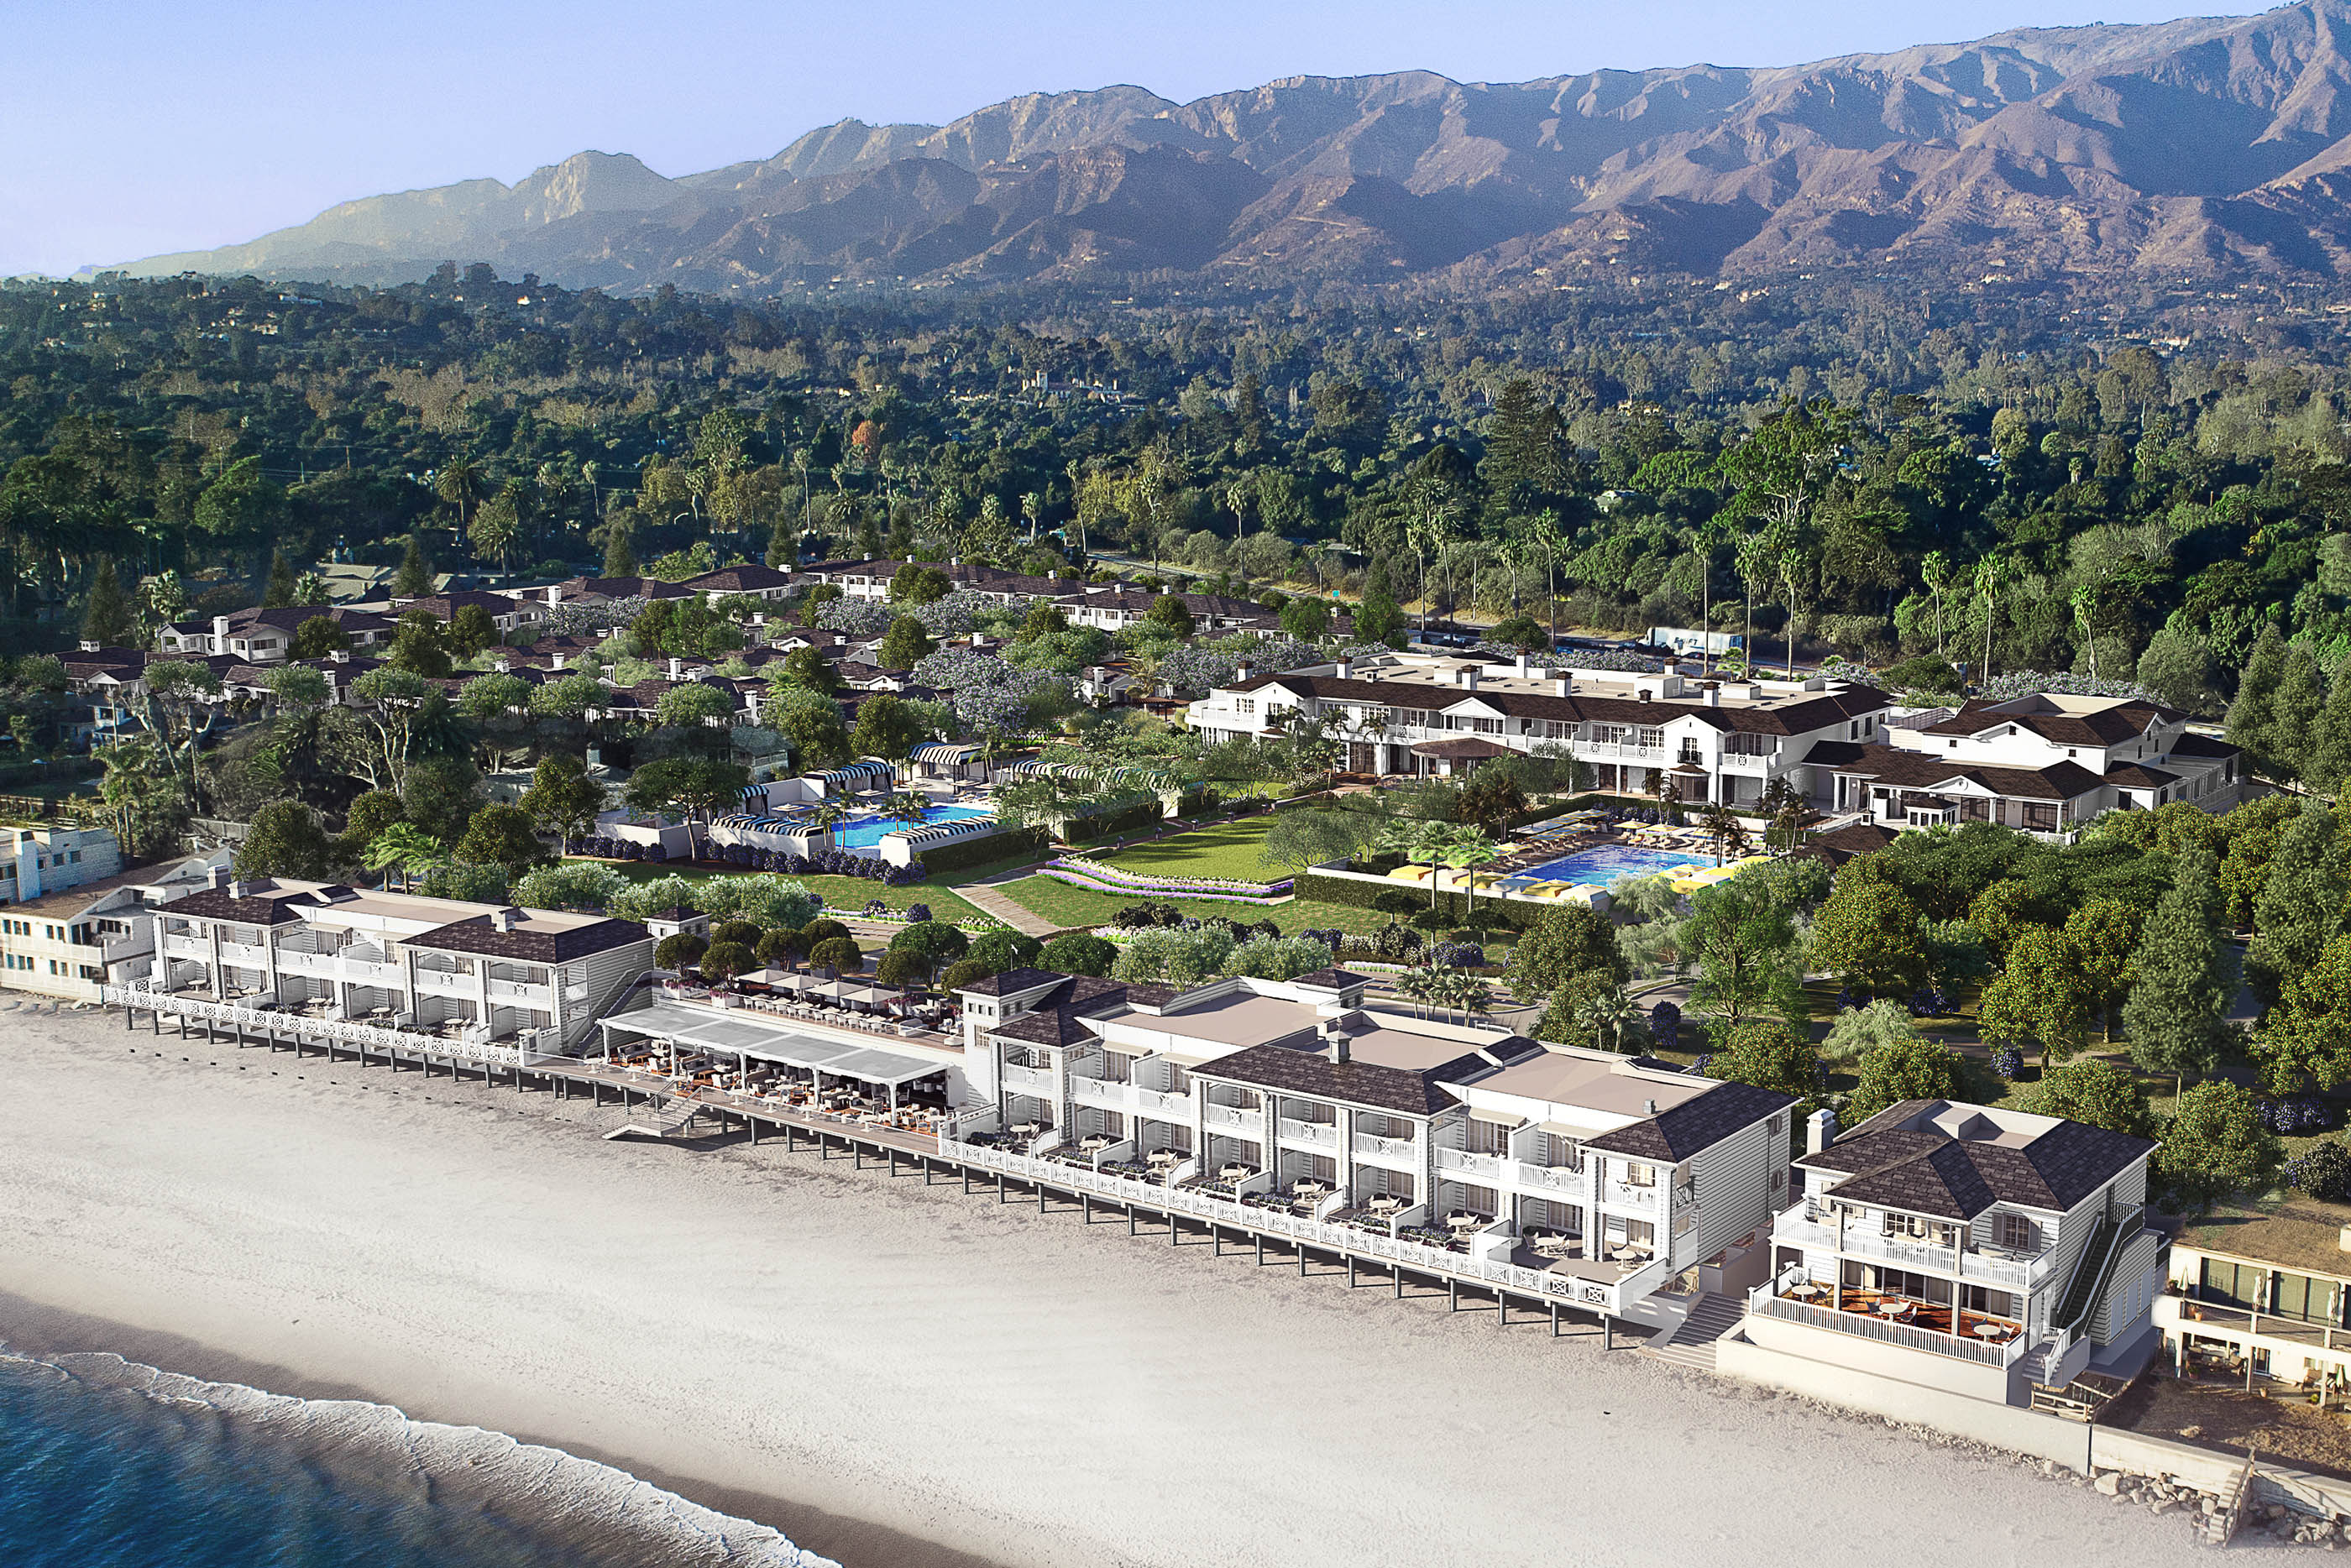 Miramar beach resort caruso publicscrutiny Choice Image